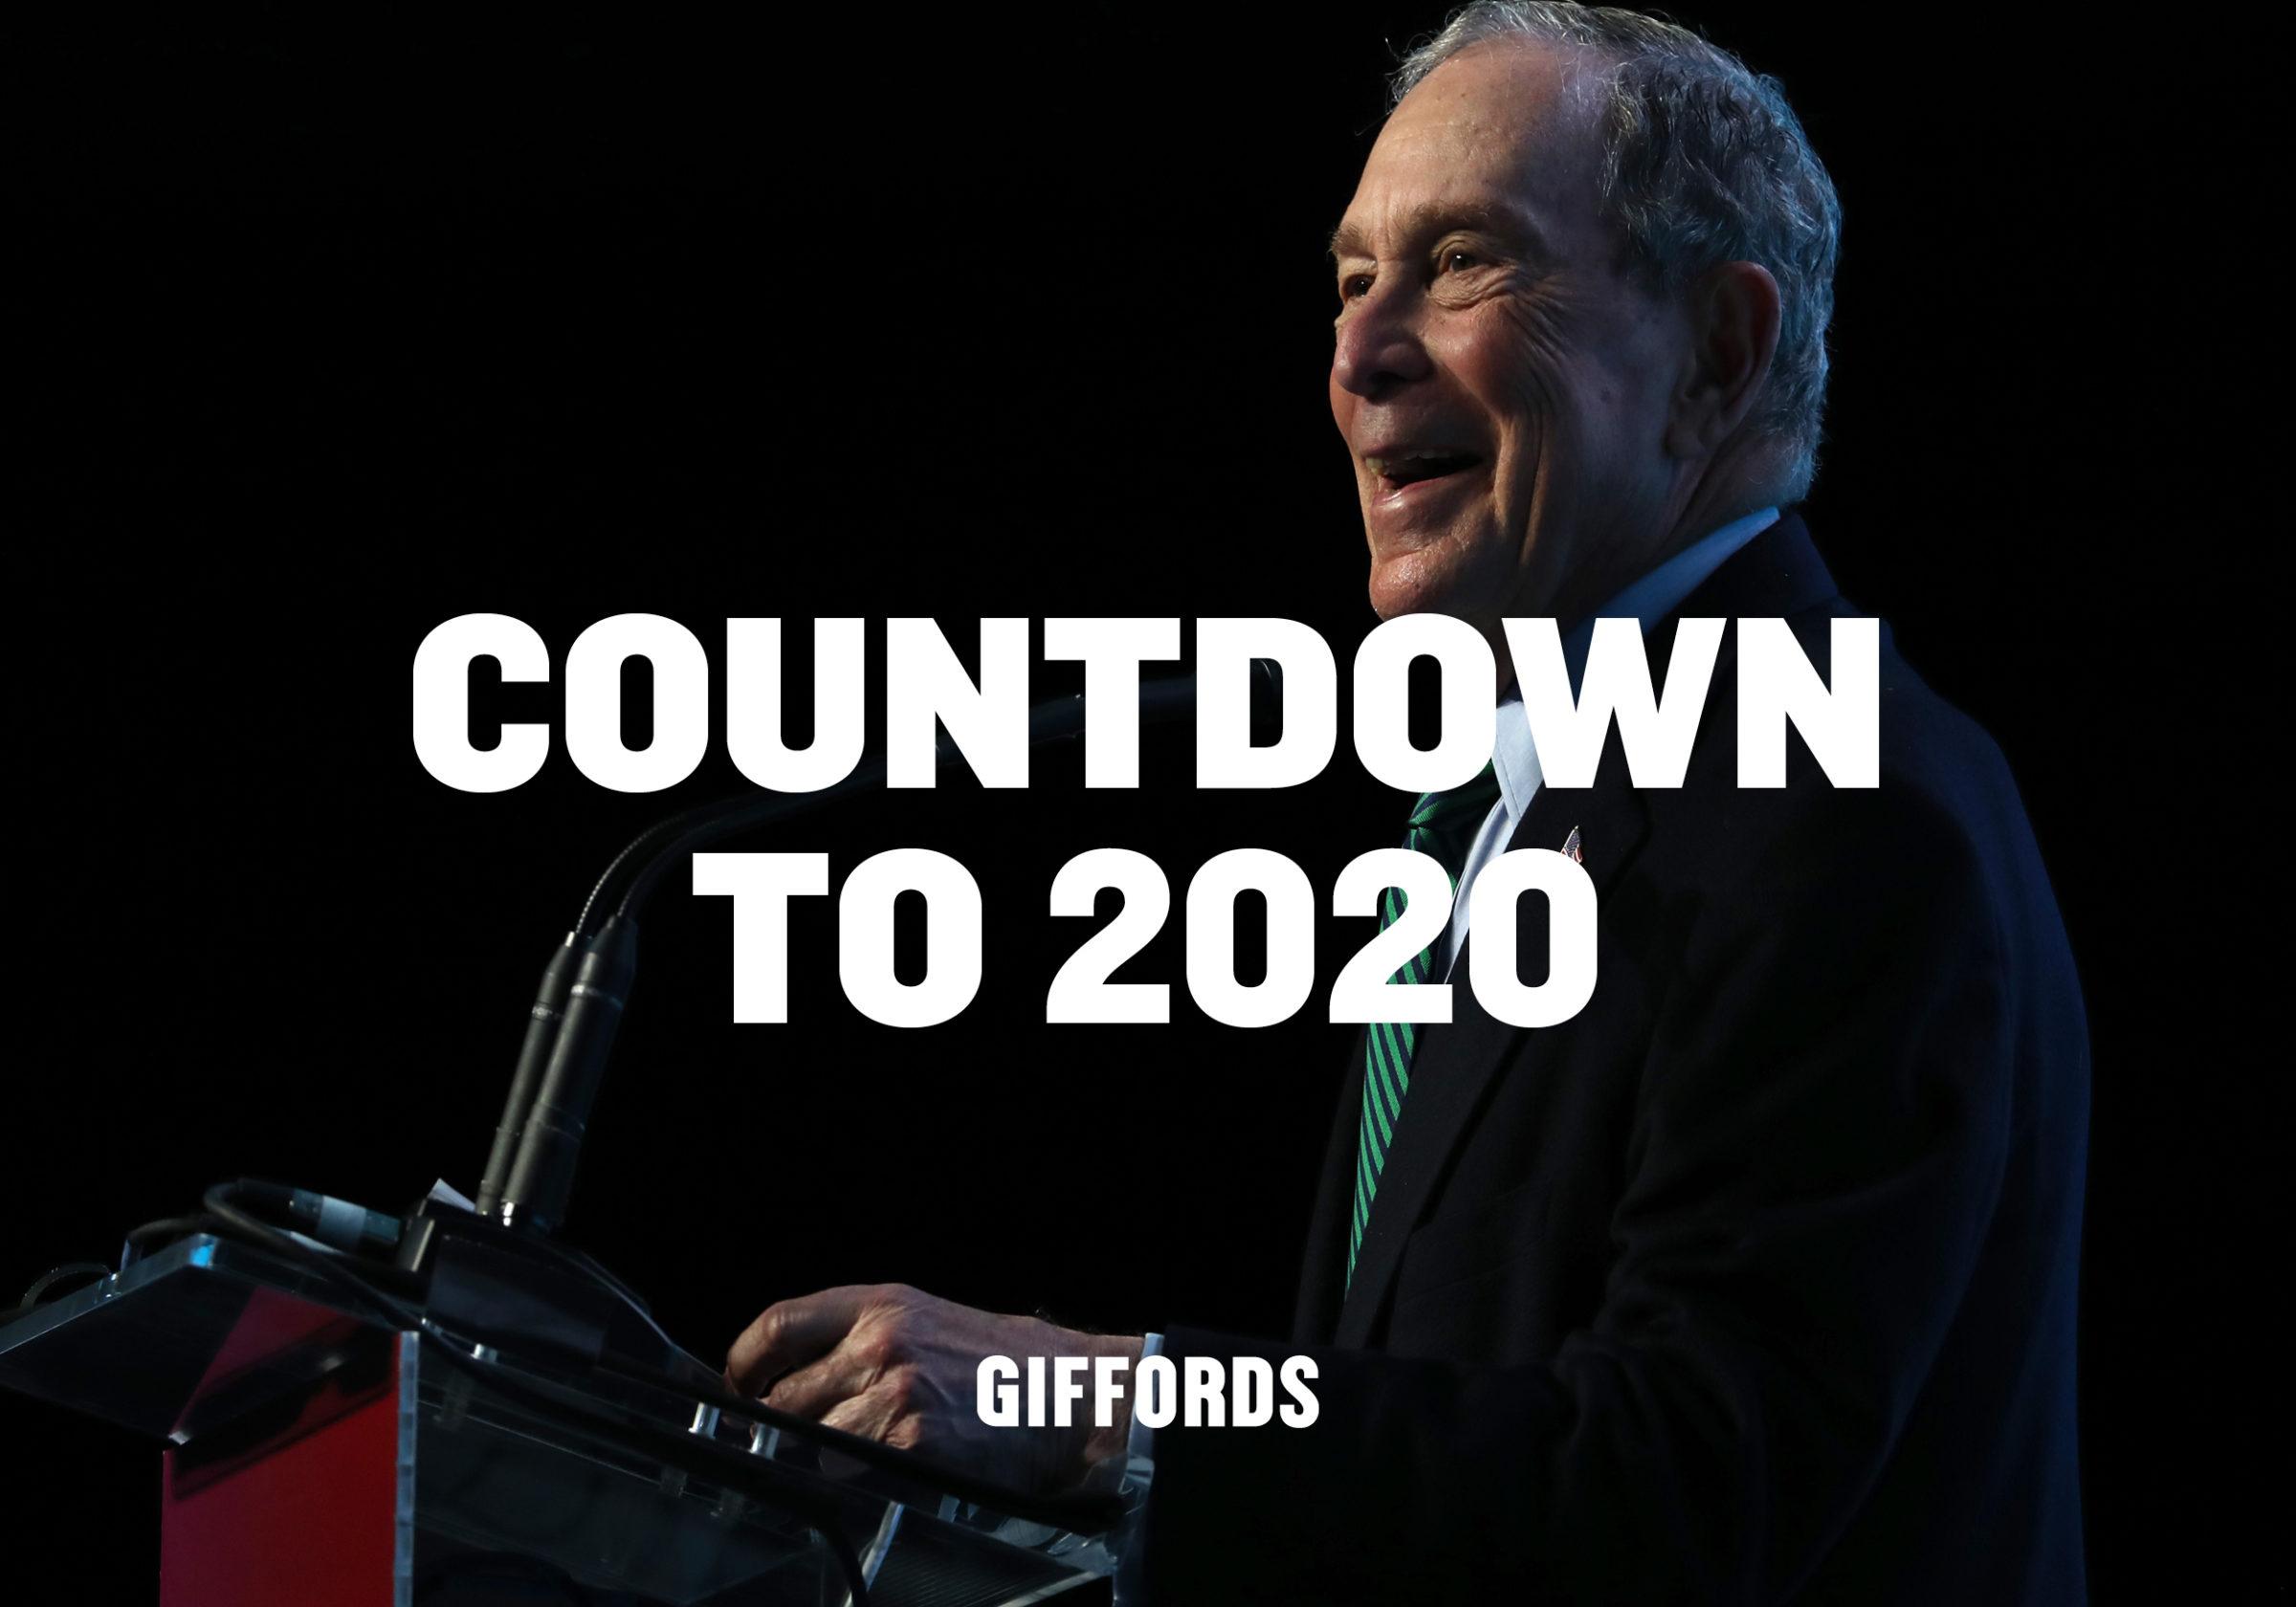 19.06-SOC-2020-Candidates-Blog-visuals_Bloomberg (1)